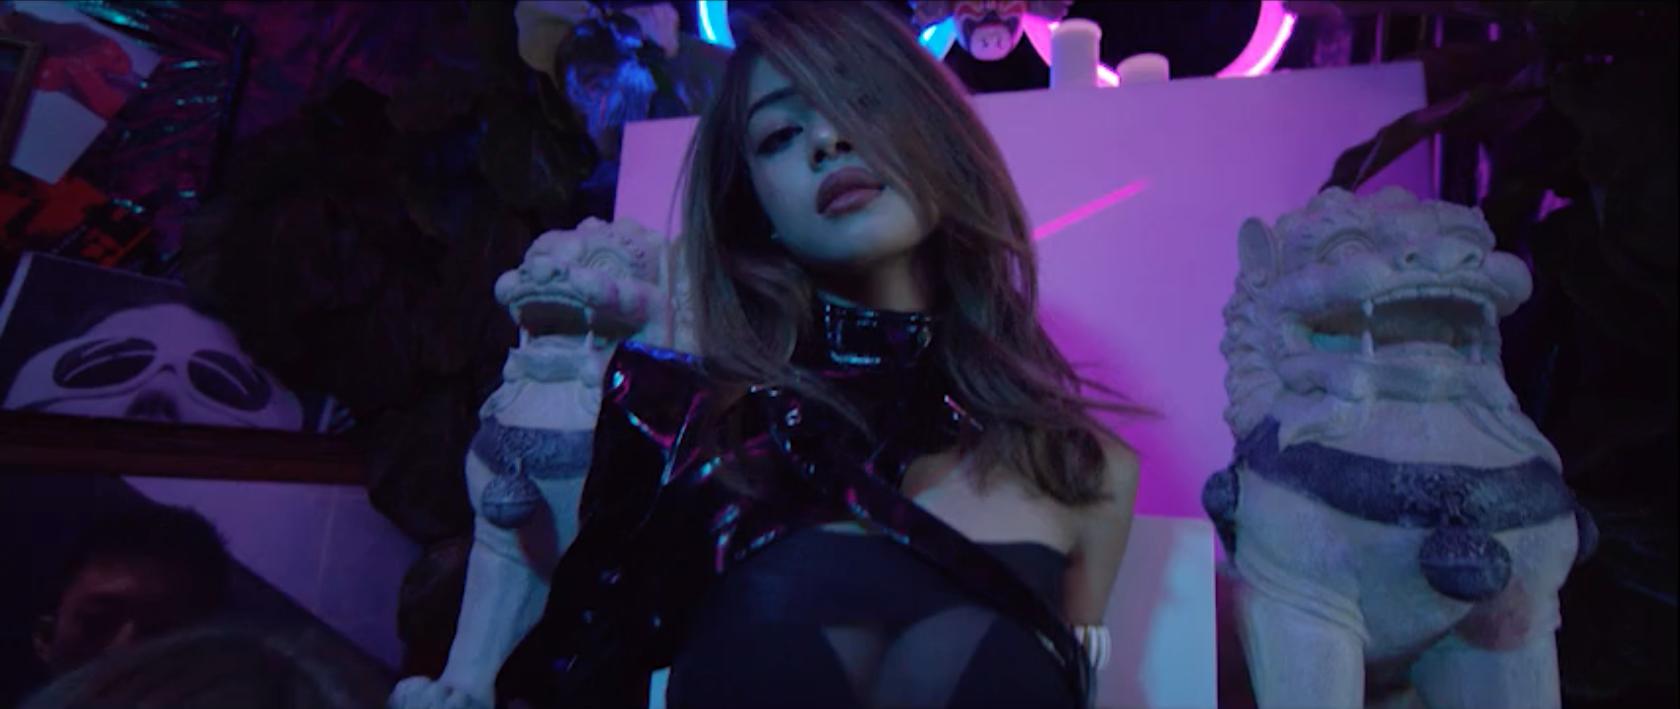 88RISING x 2016 - Music Video